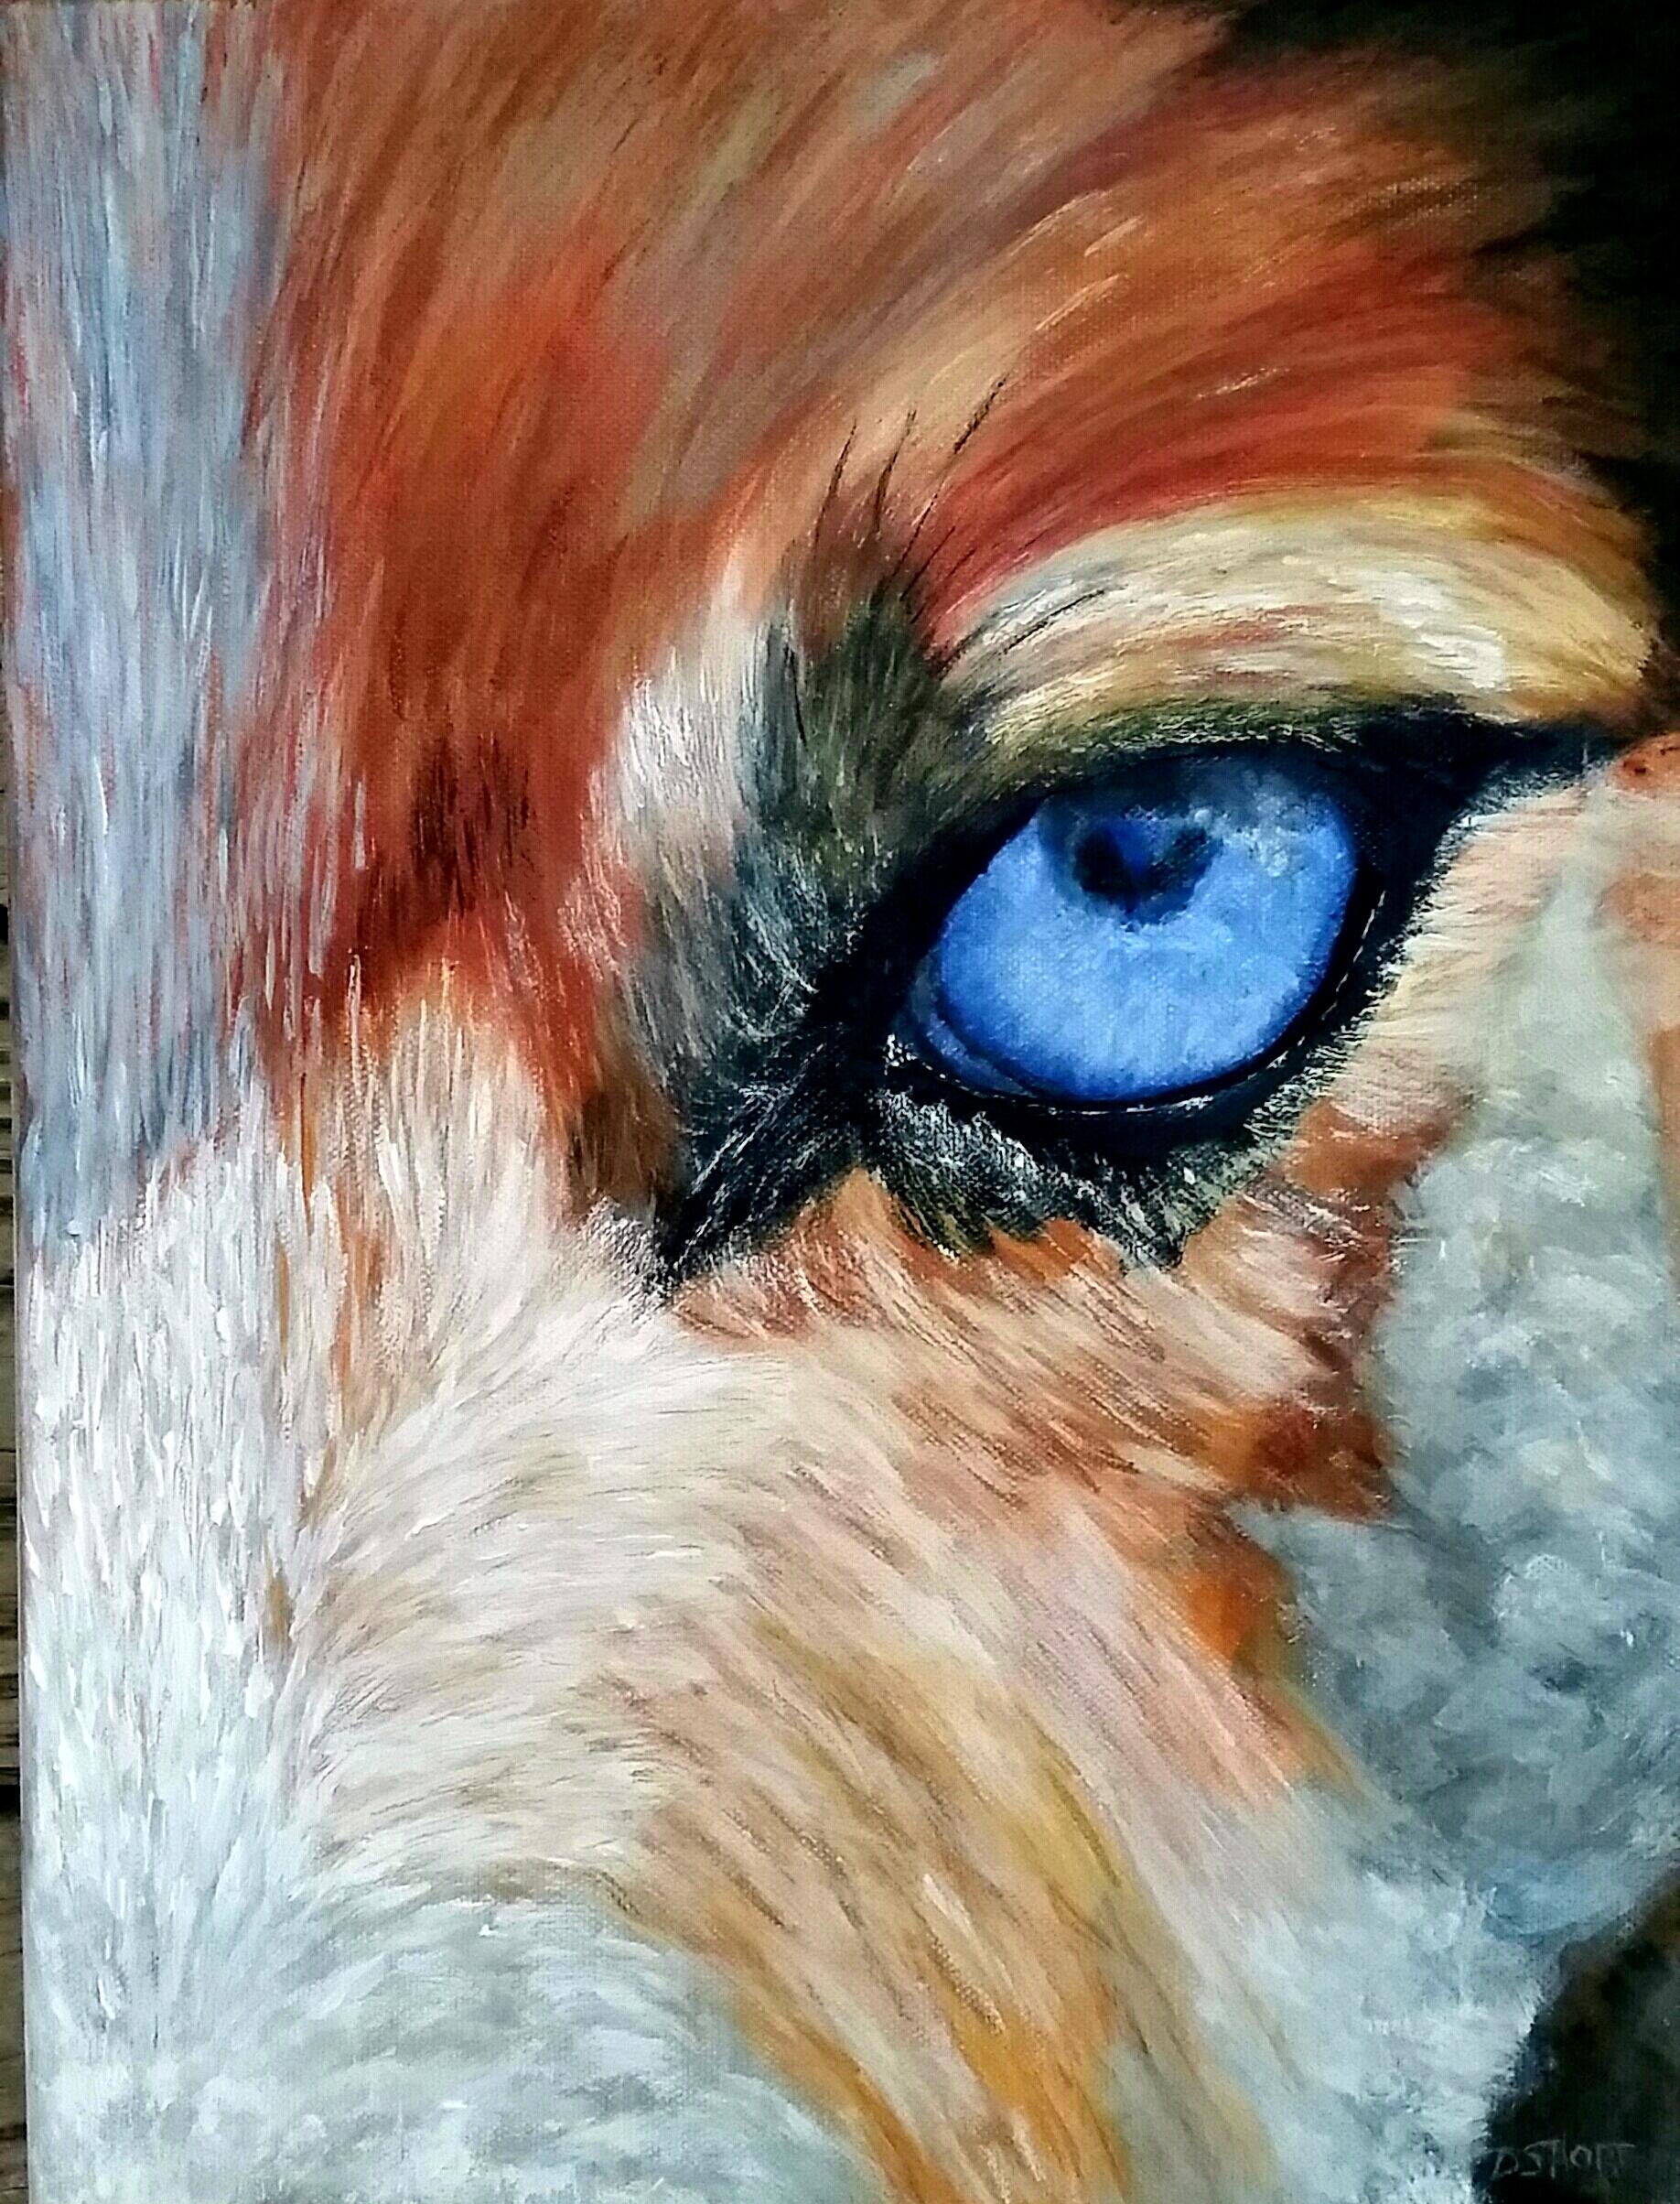 contemporary realist, artist David Short, Virginia oil painter, landscapes, still life, florals, expressive nature, Richmond